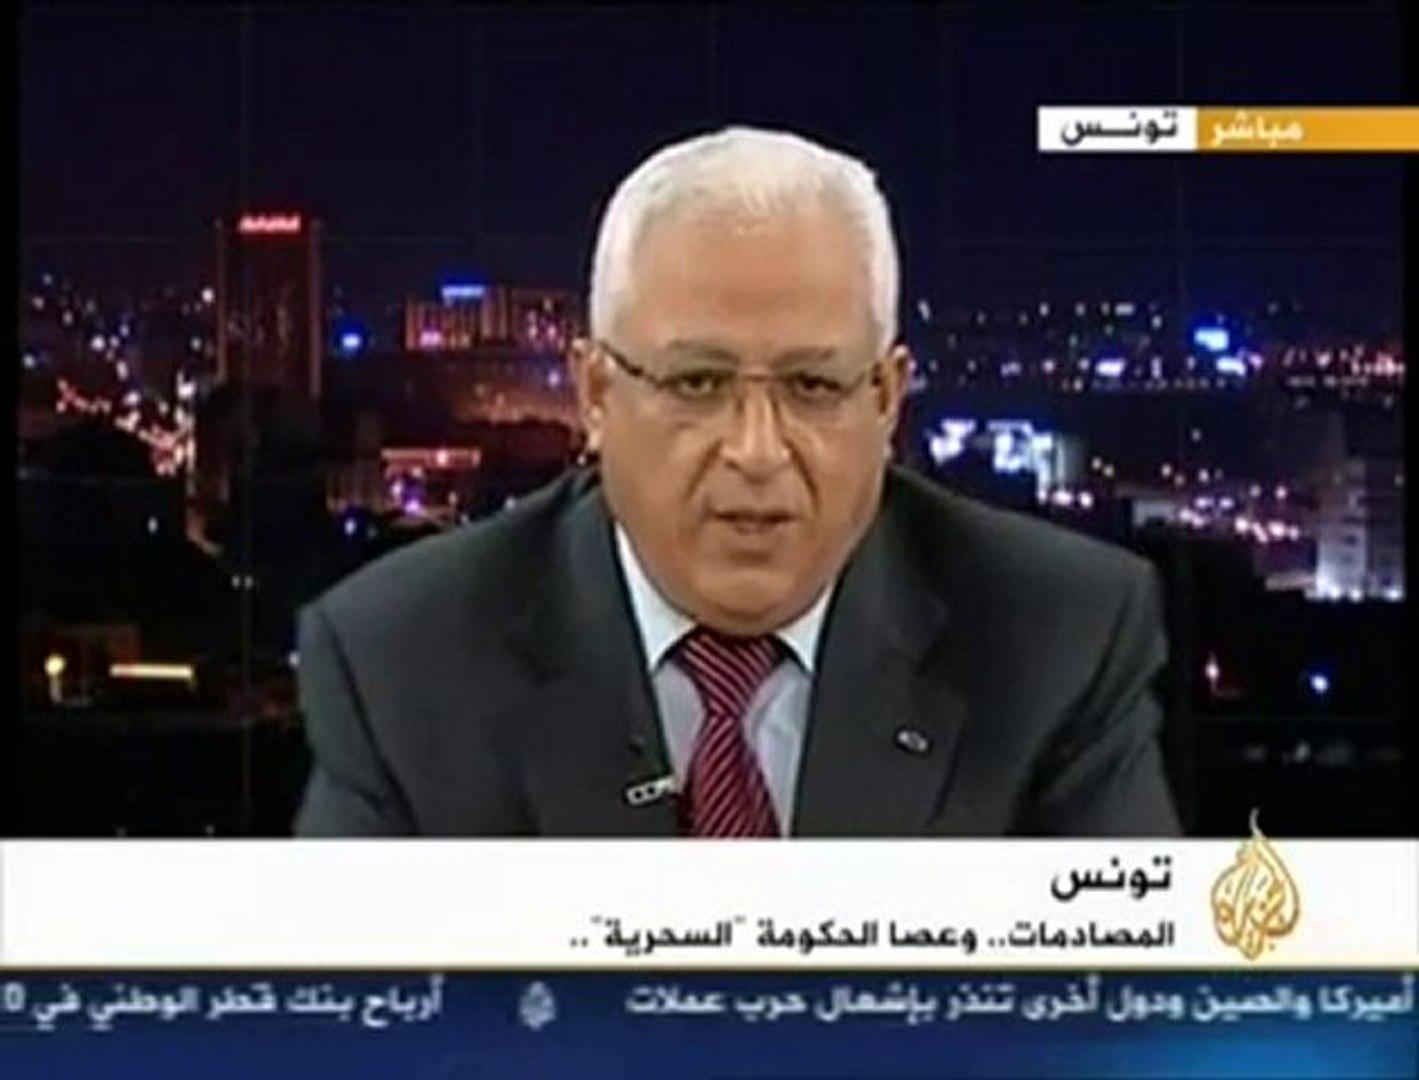 Le clone, le ministre de l'éducation tunisien - Aljazeera 10